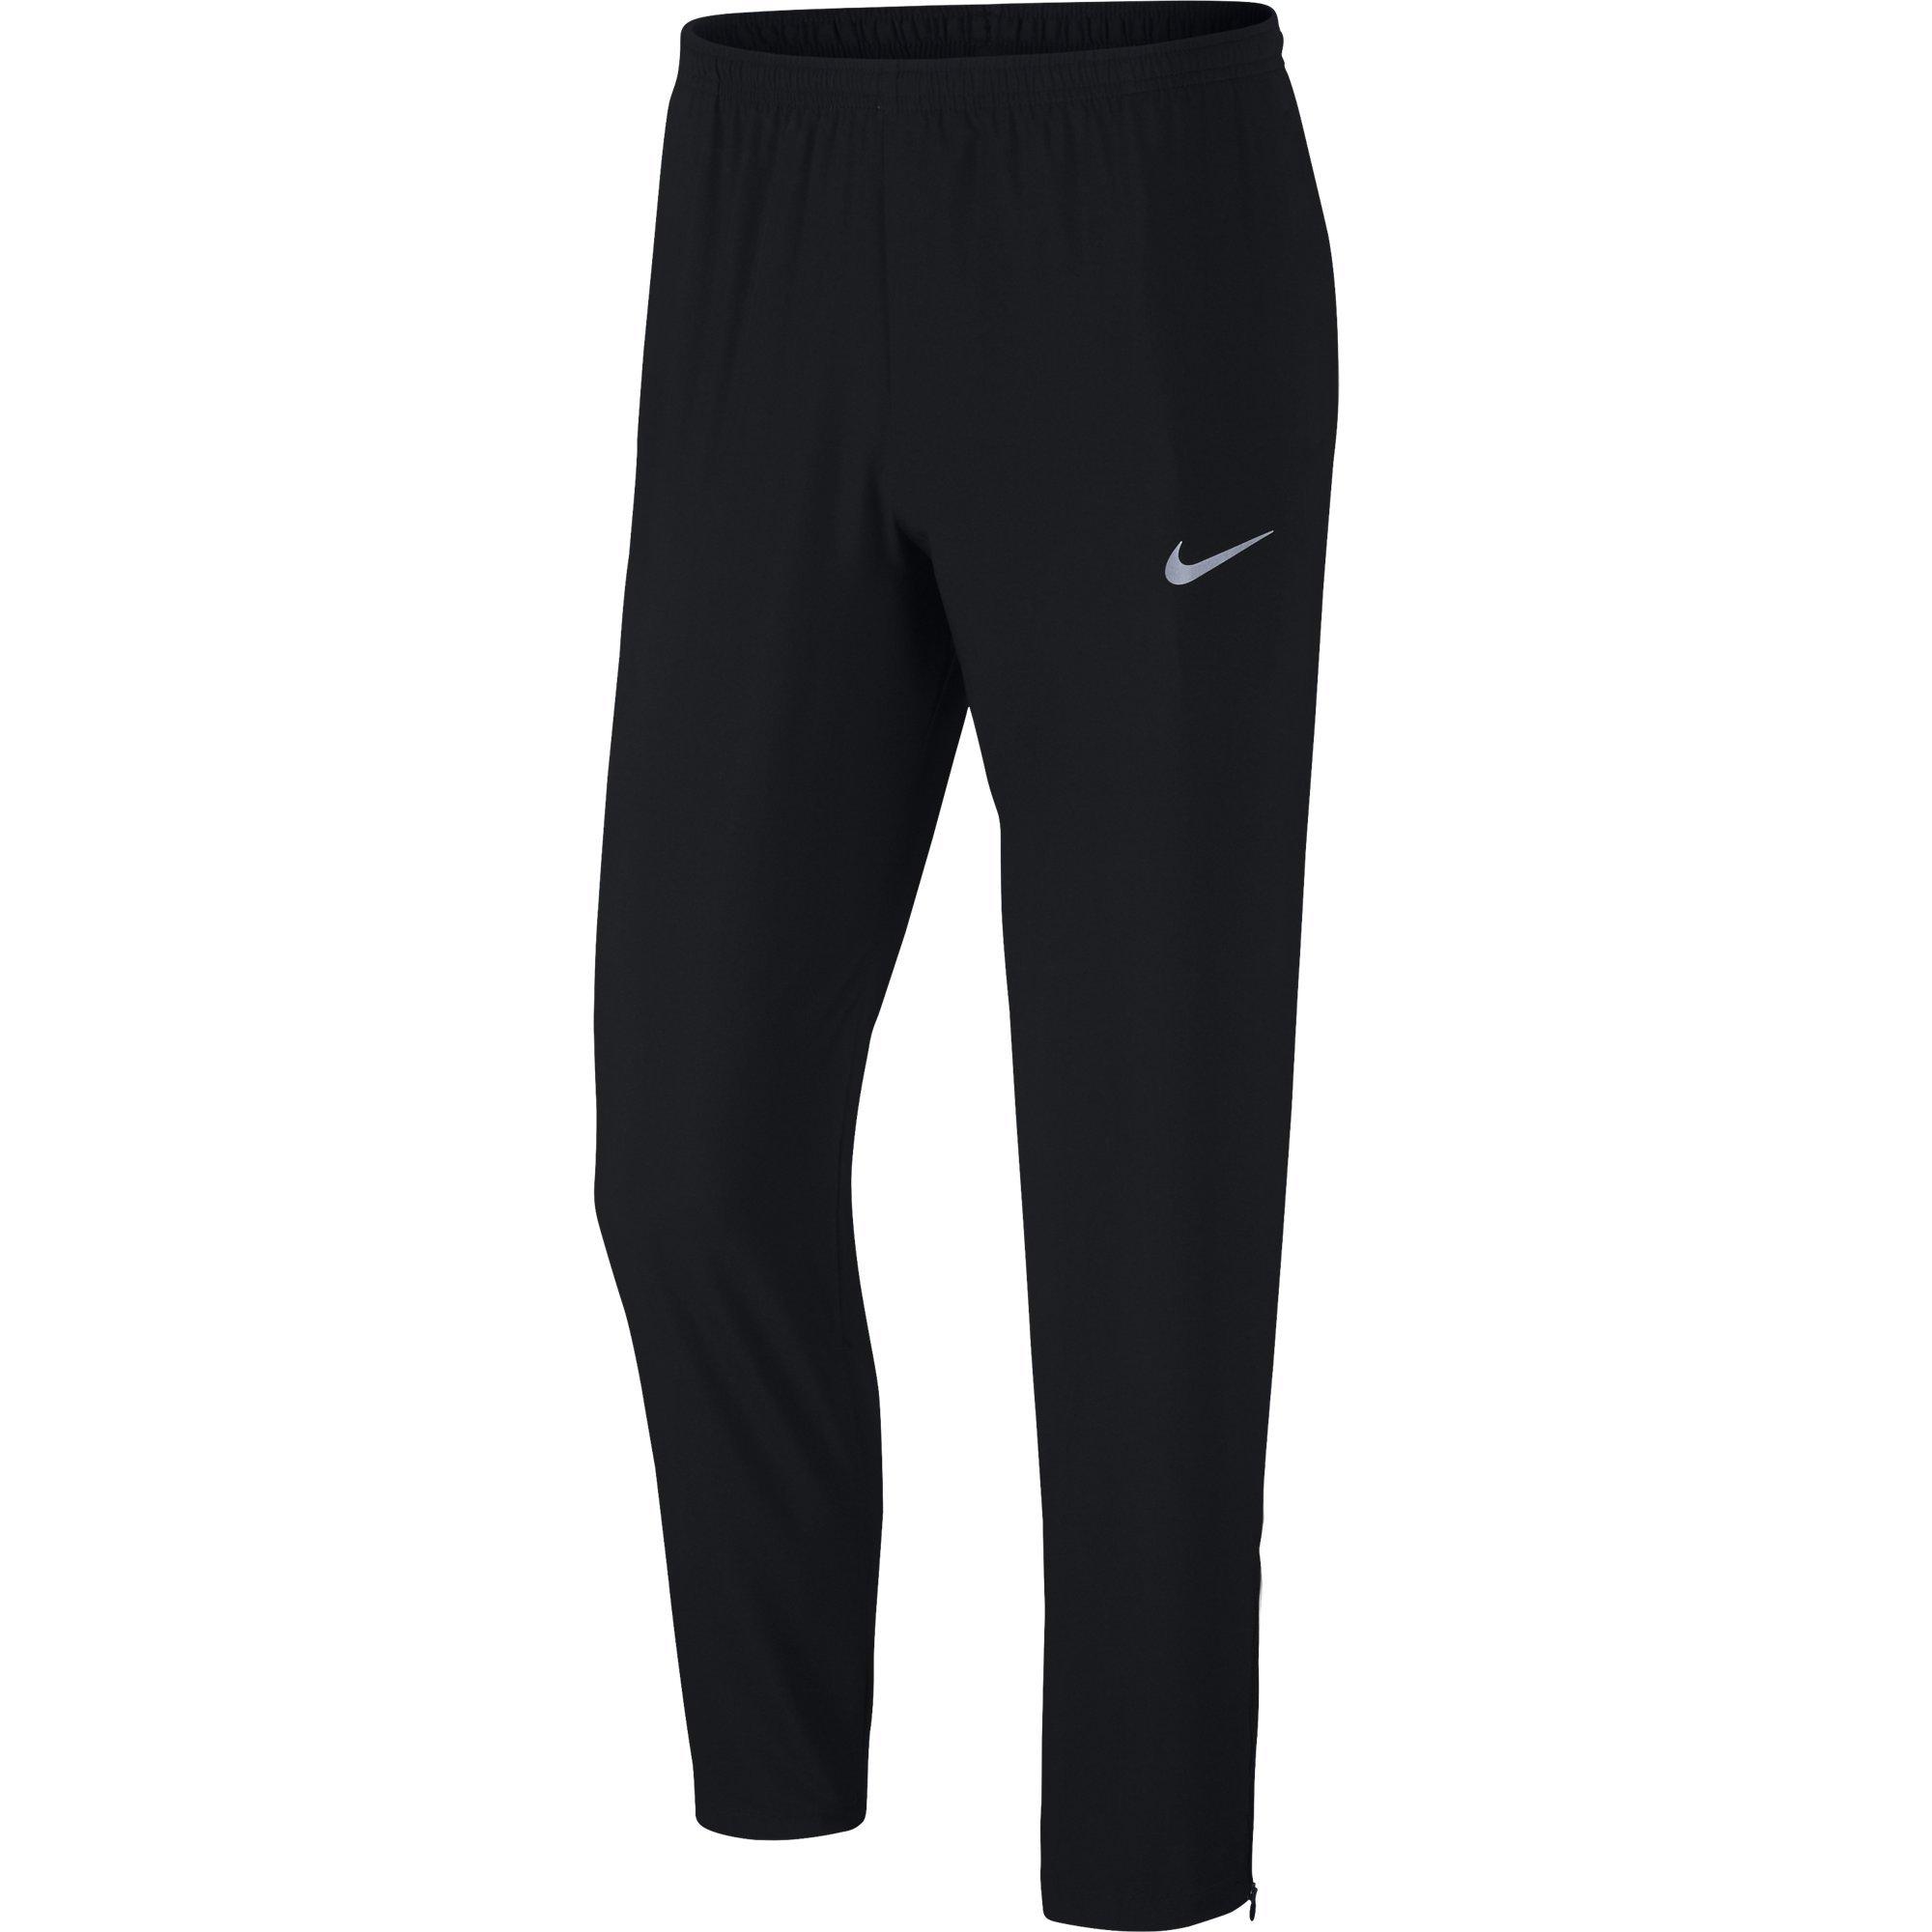 NIKE Men's Running Pants, Black, Small by Nike